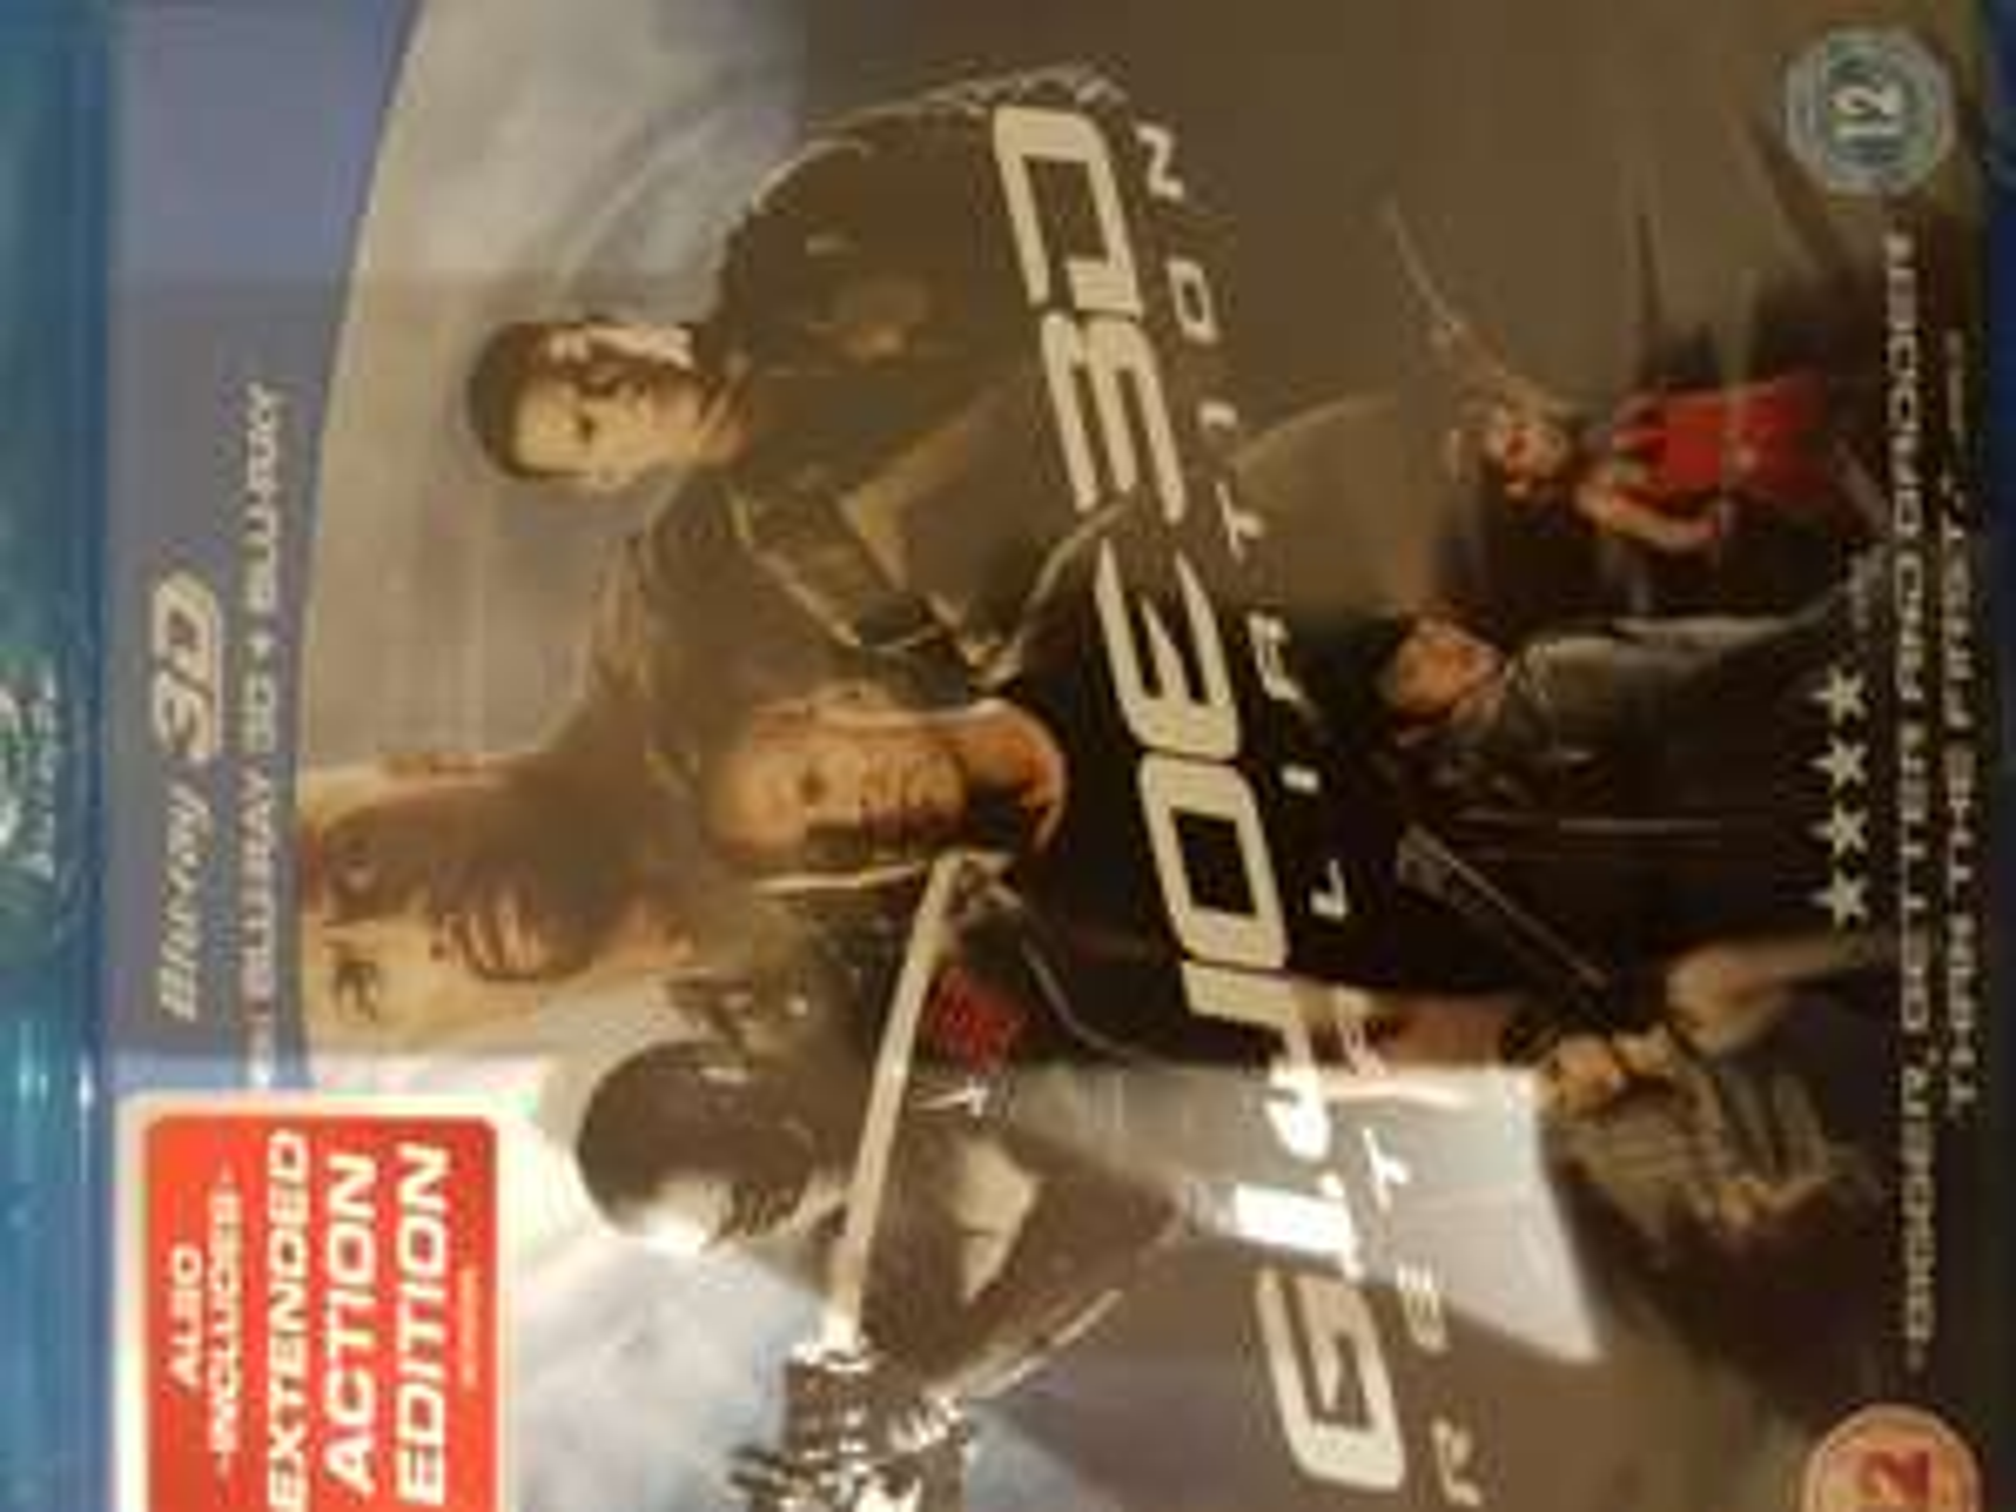 GI Joe Retribution 3D Blu Ray £1 in Poundland